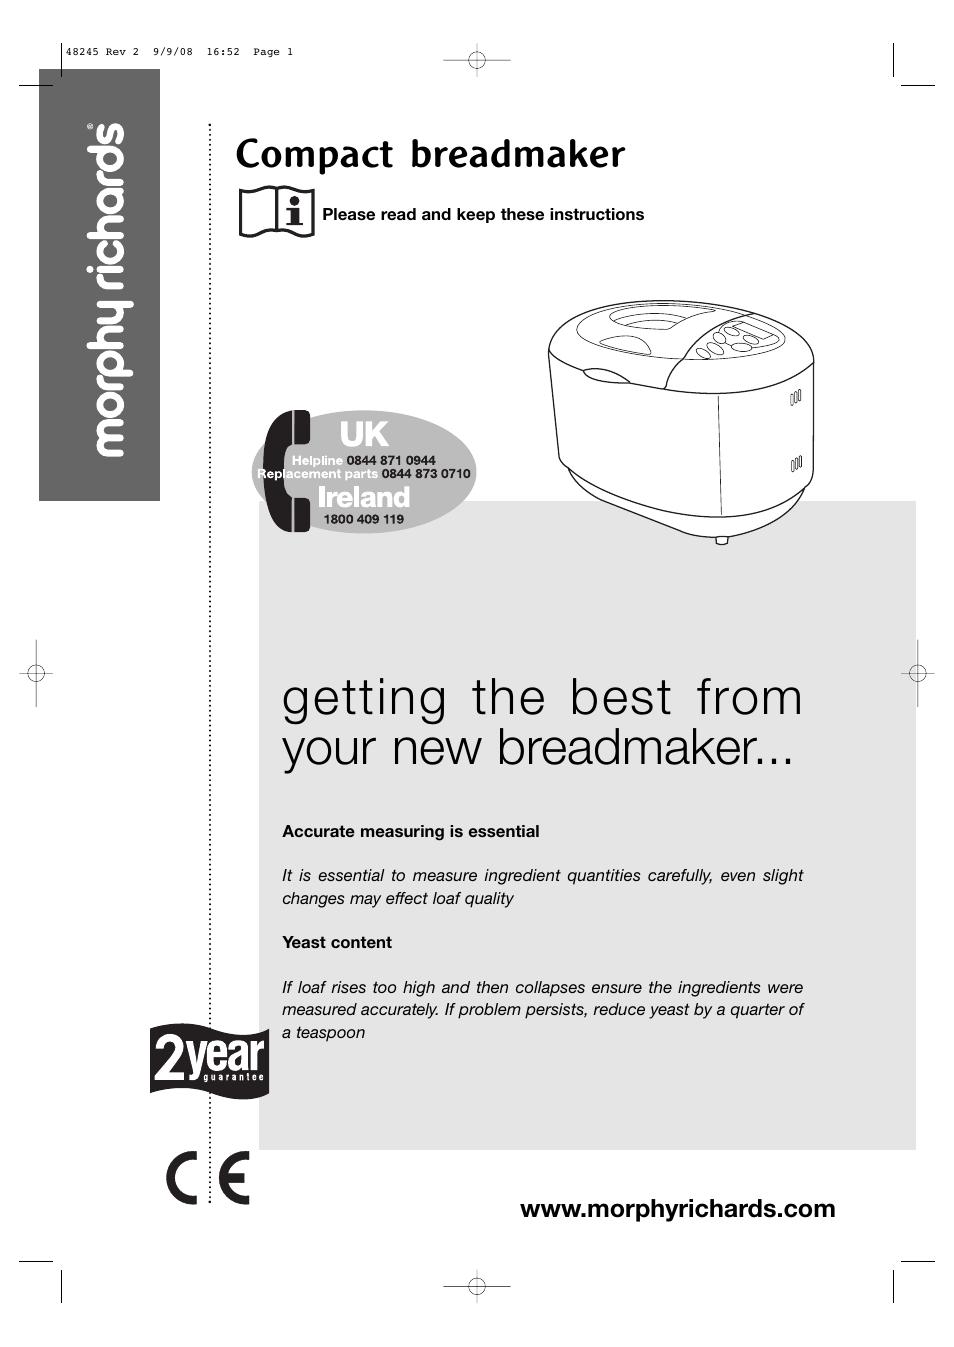 morphy richards 48245 user manual 26 pages rh manualsdir com morphy richards breadmaker model 48245 manual Morphy Richards Logo